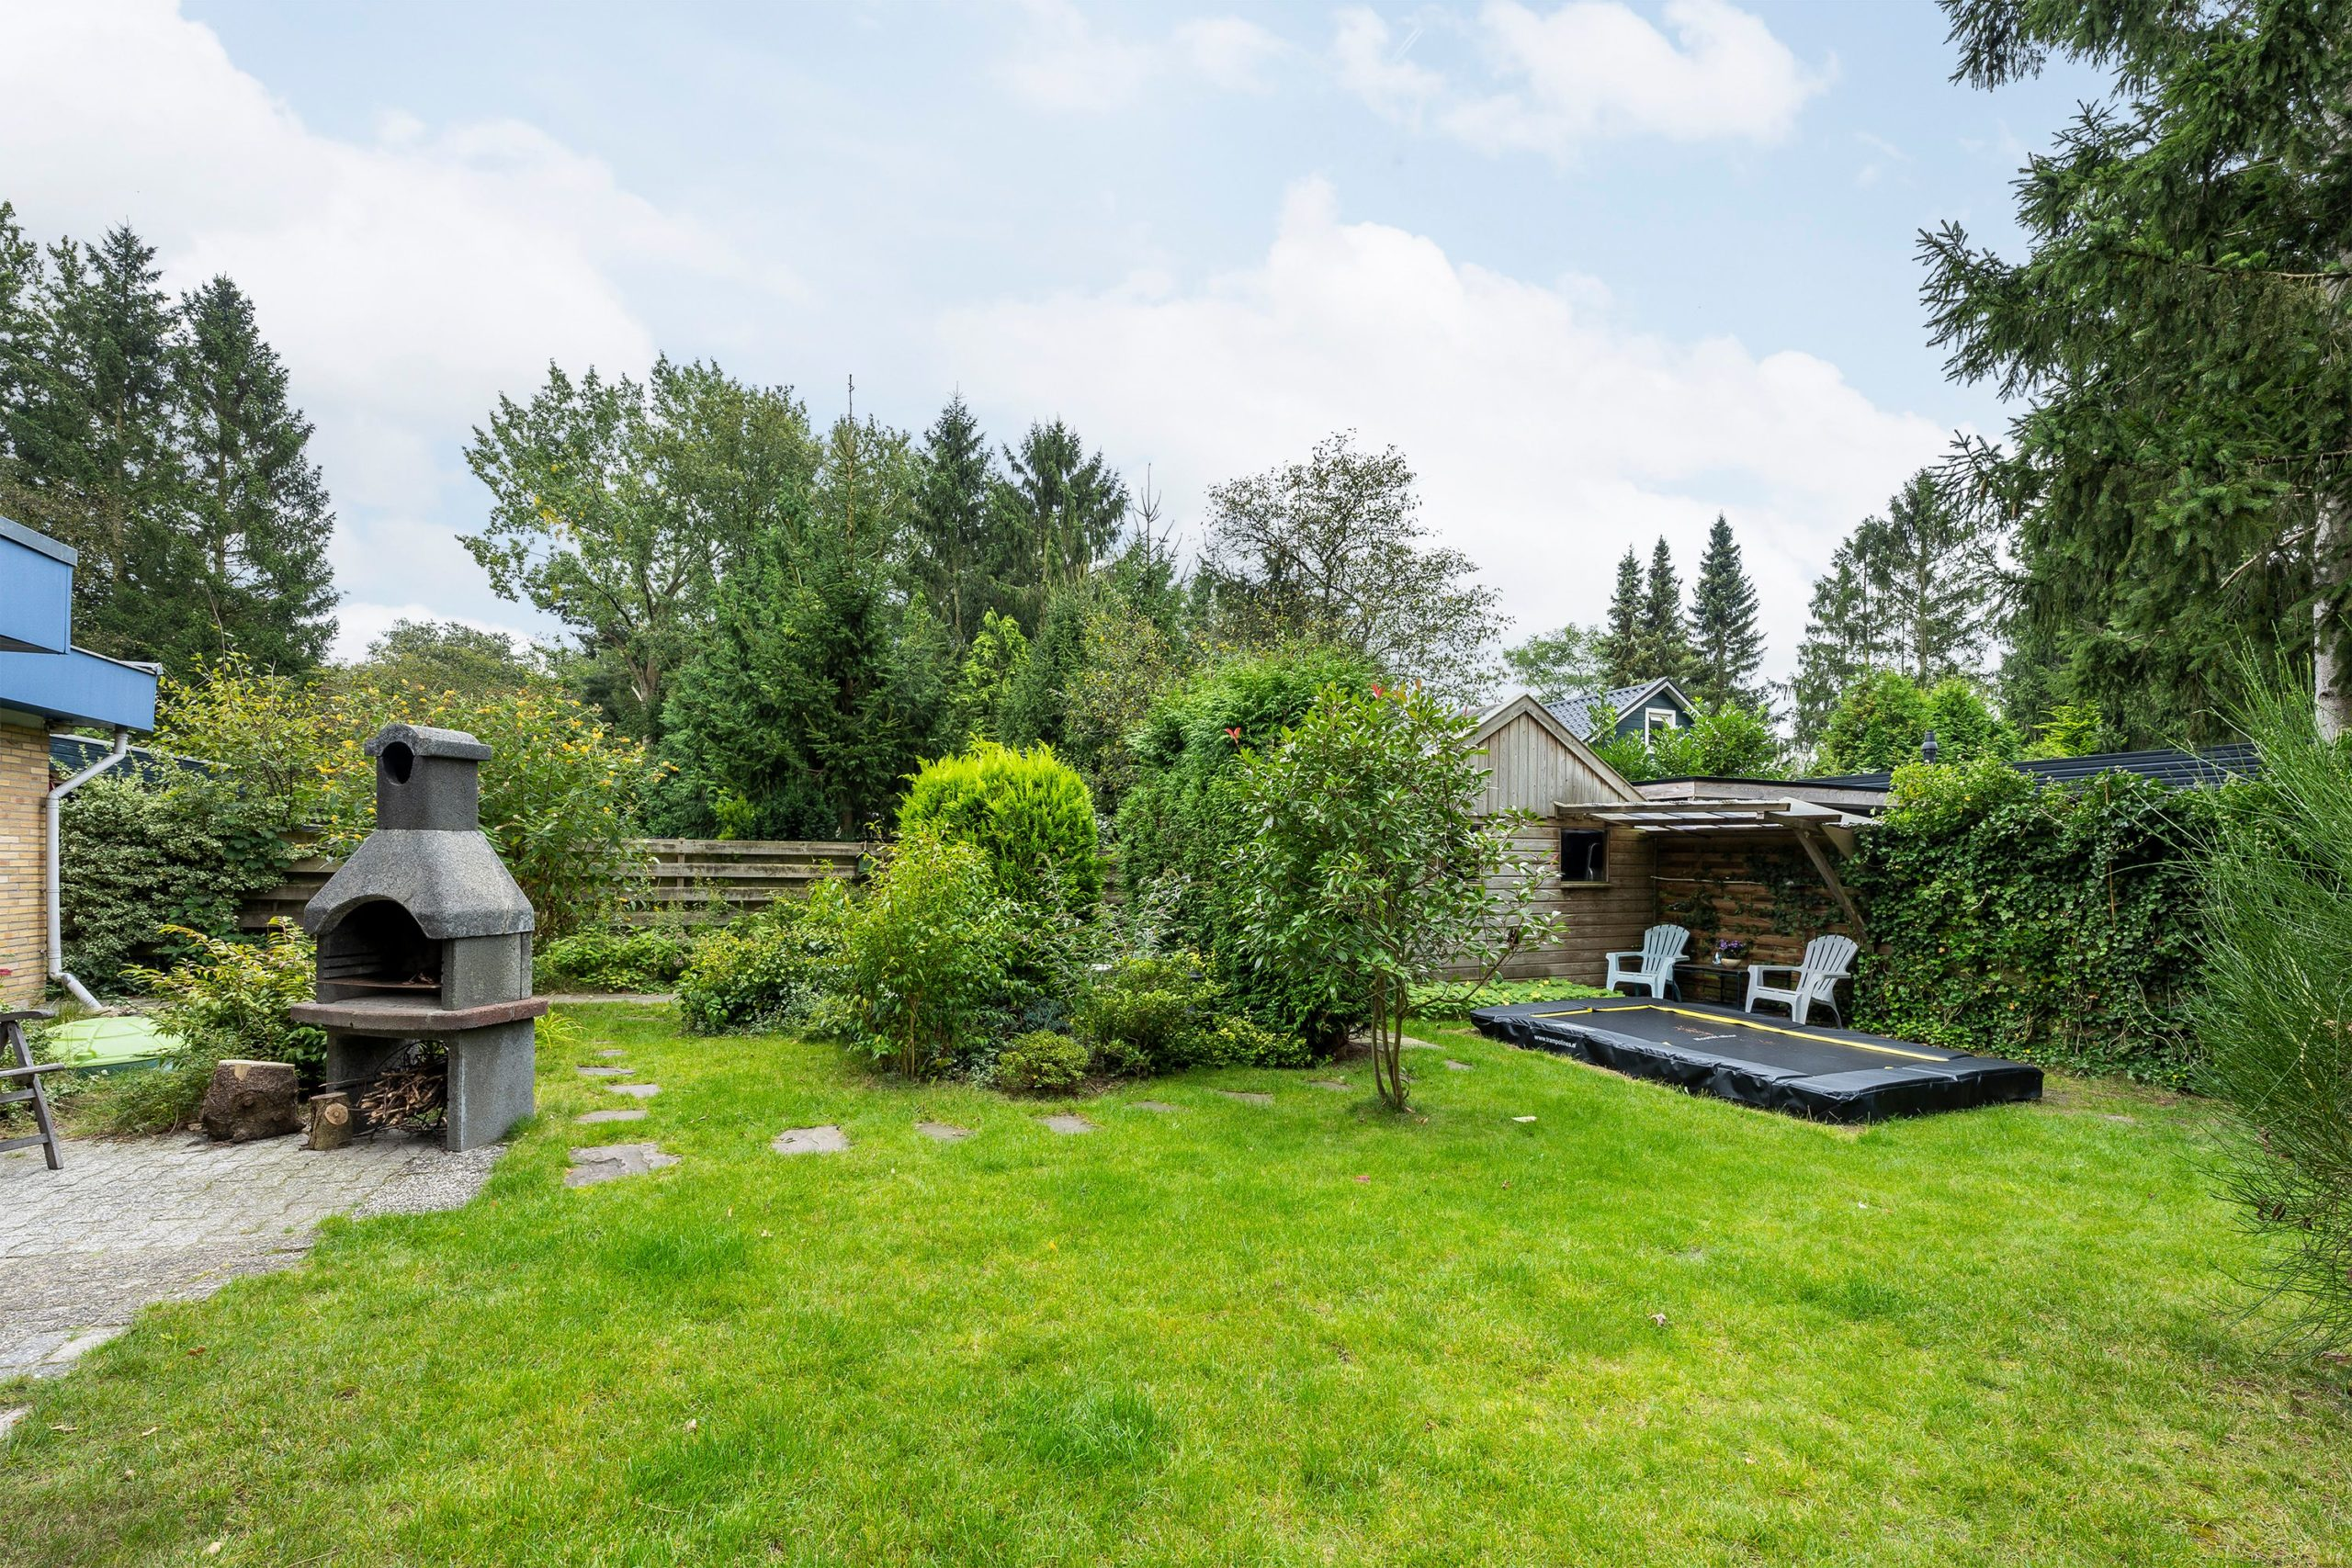 blauwe-boshuis-tuin-met-trampoline-en-haard